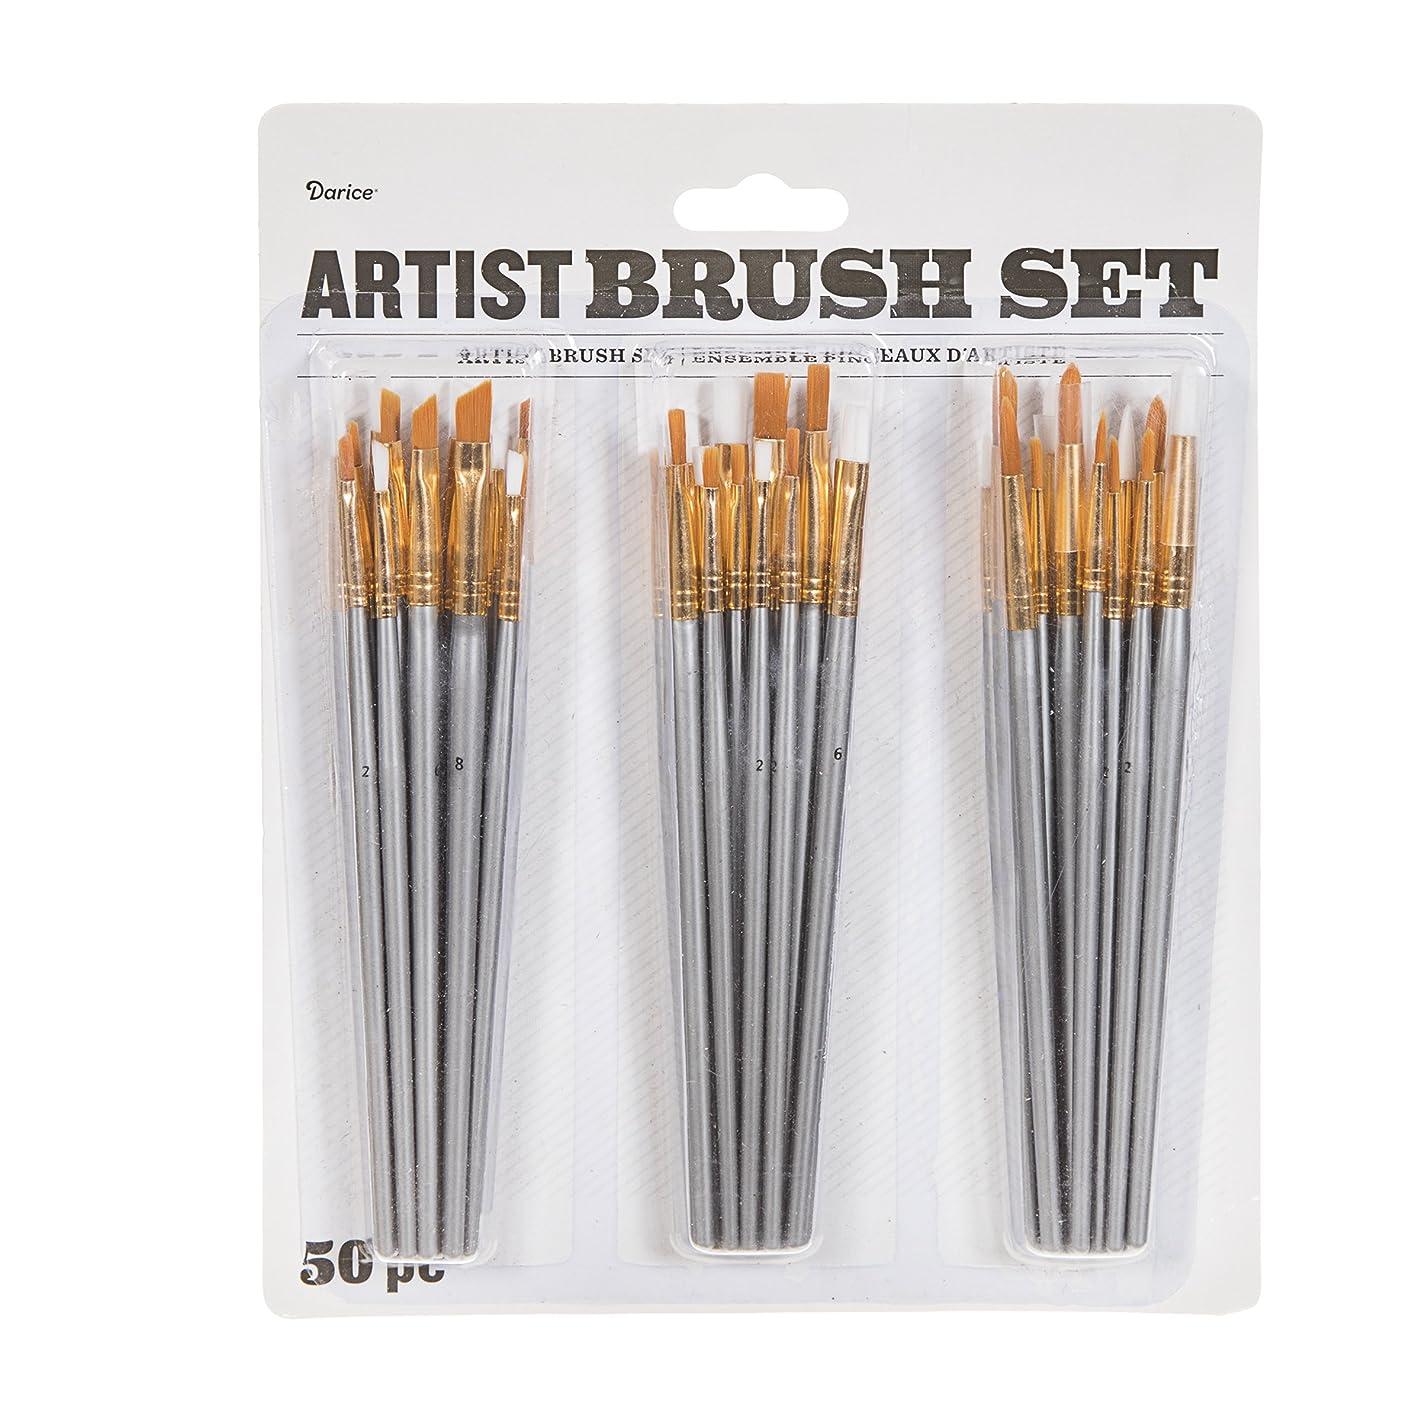 STUDIO 71 ARTIST 30052389 Artist Set Paint Brush Multicolor